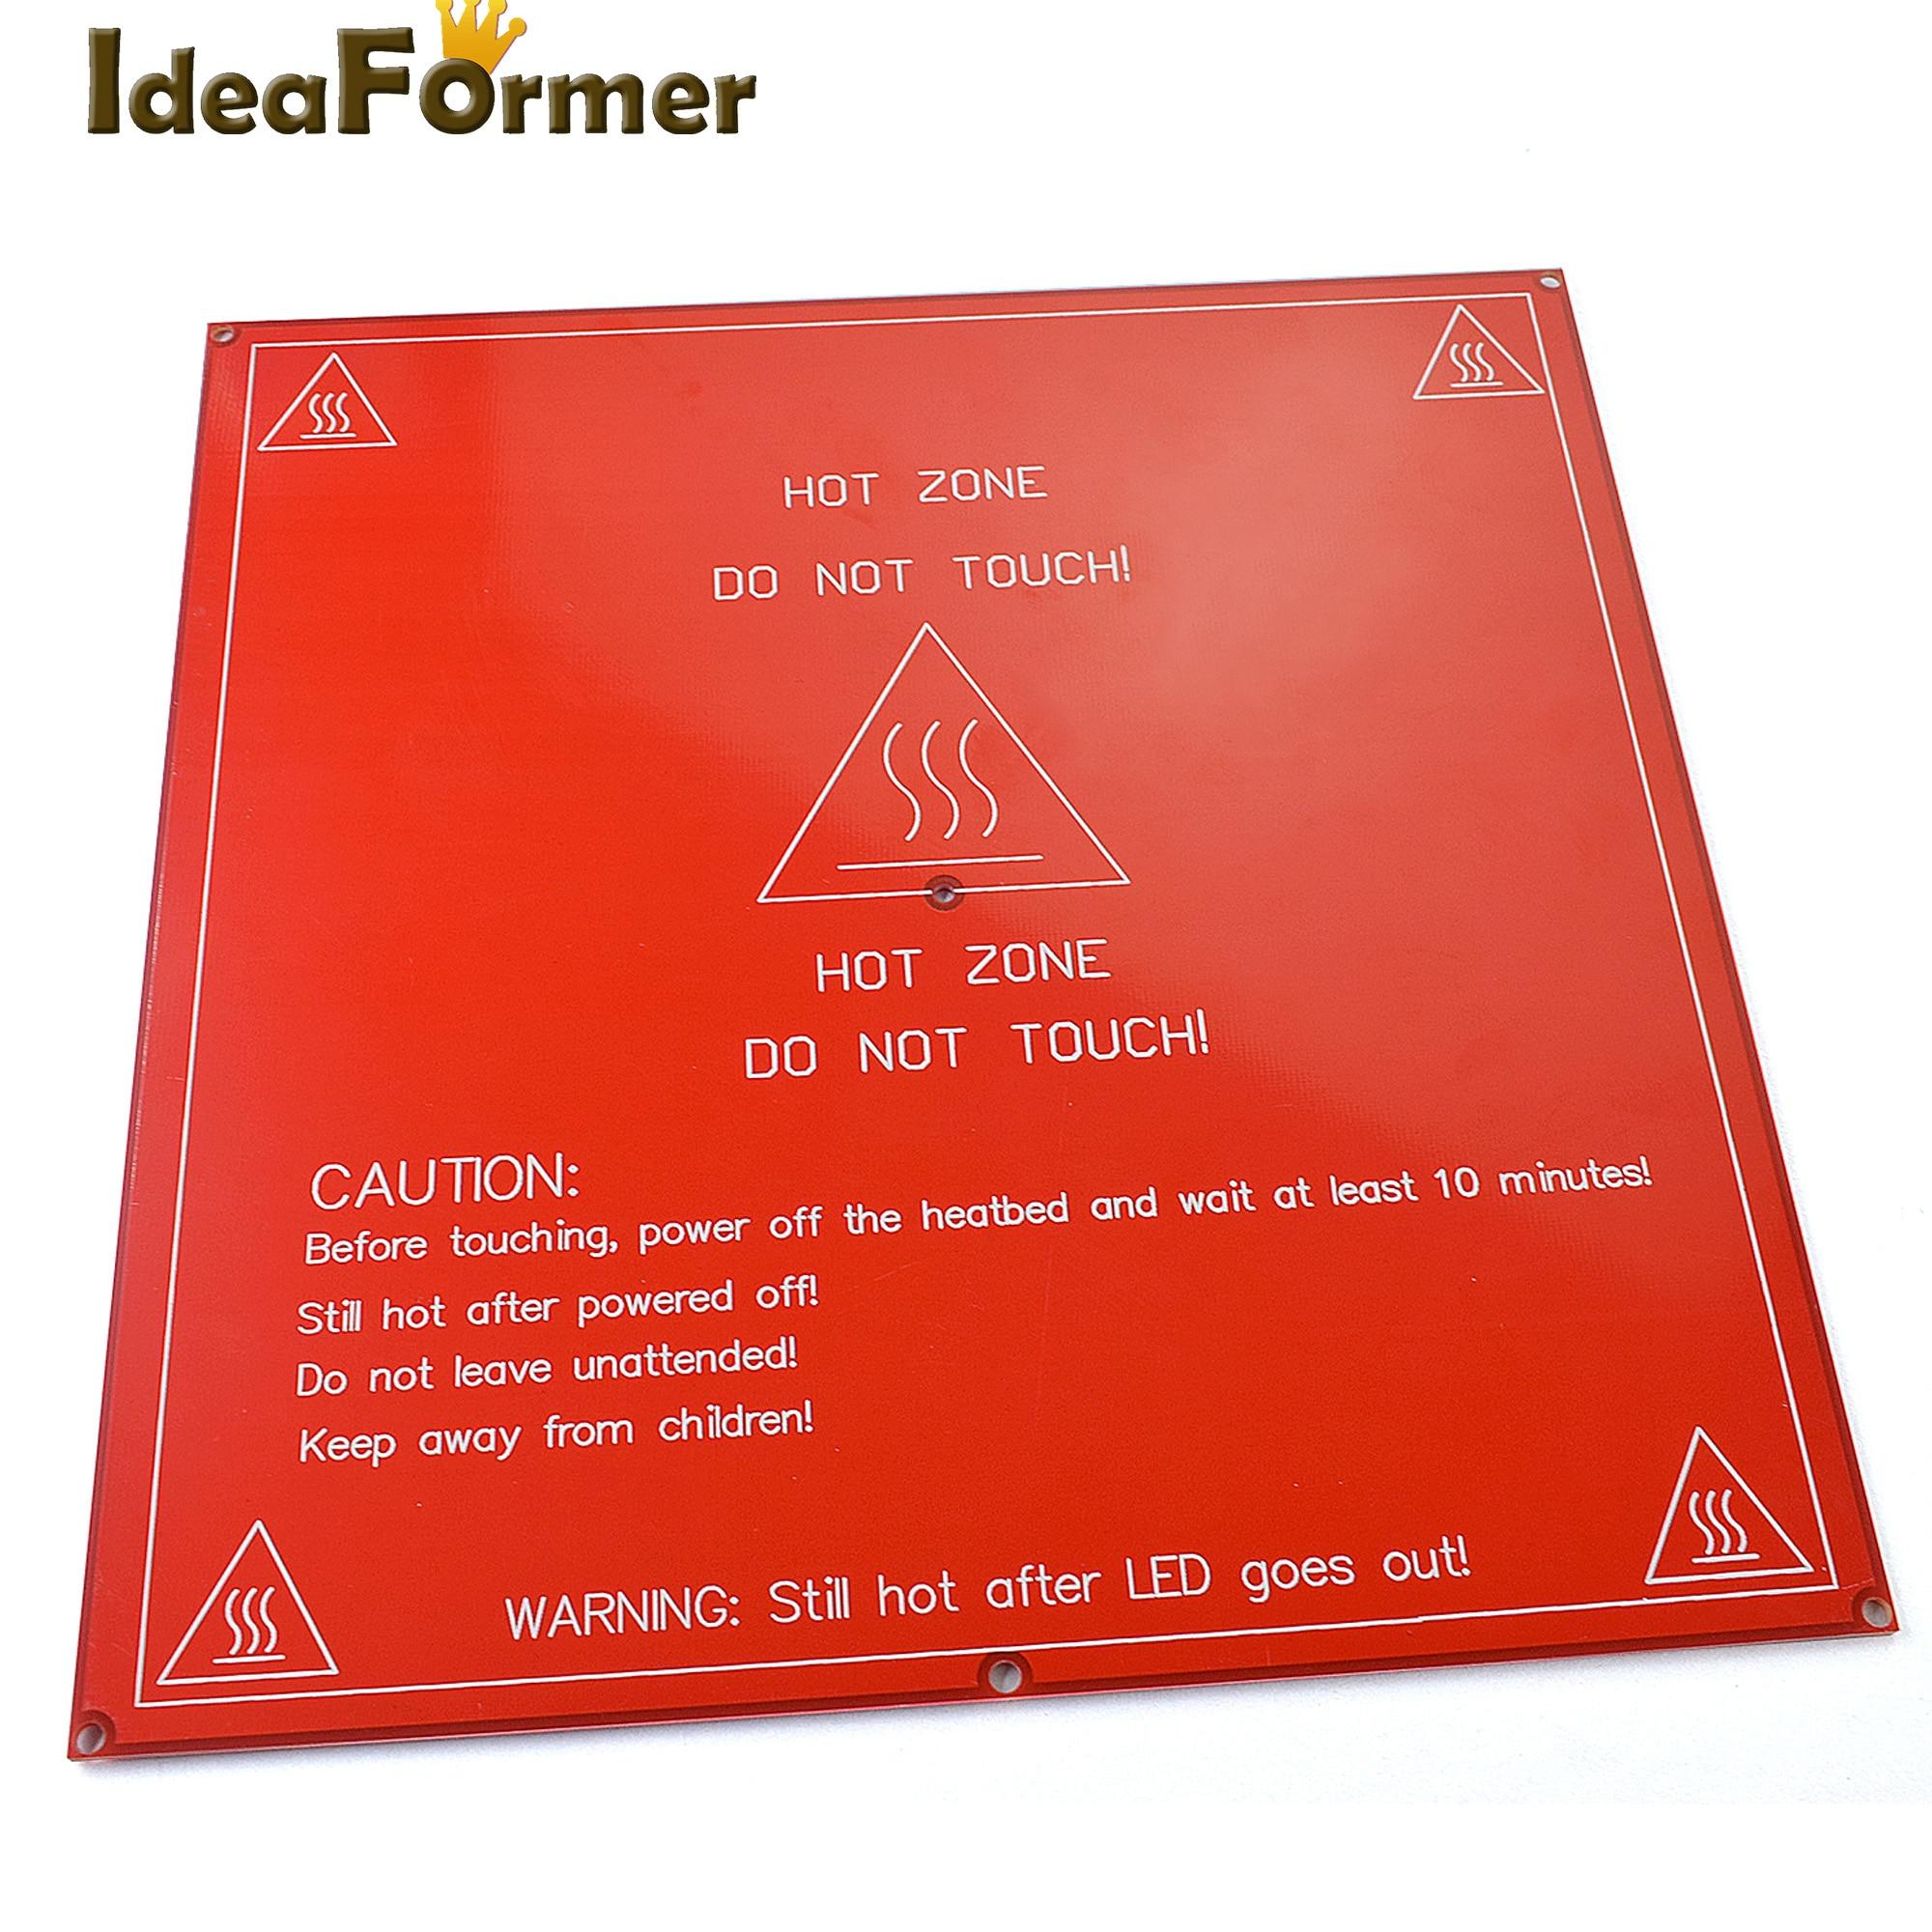 RepRap PCB Heatbed MK2B square Heat Bed Hot Plate For Prusa Mendel 3D Printer parts 3d printer 3mm square pcb heat bed mk3 reprap hot plate dual voltage 12 24v